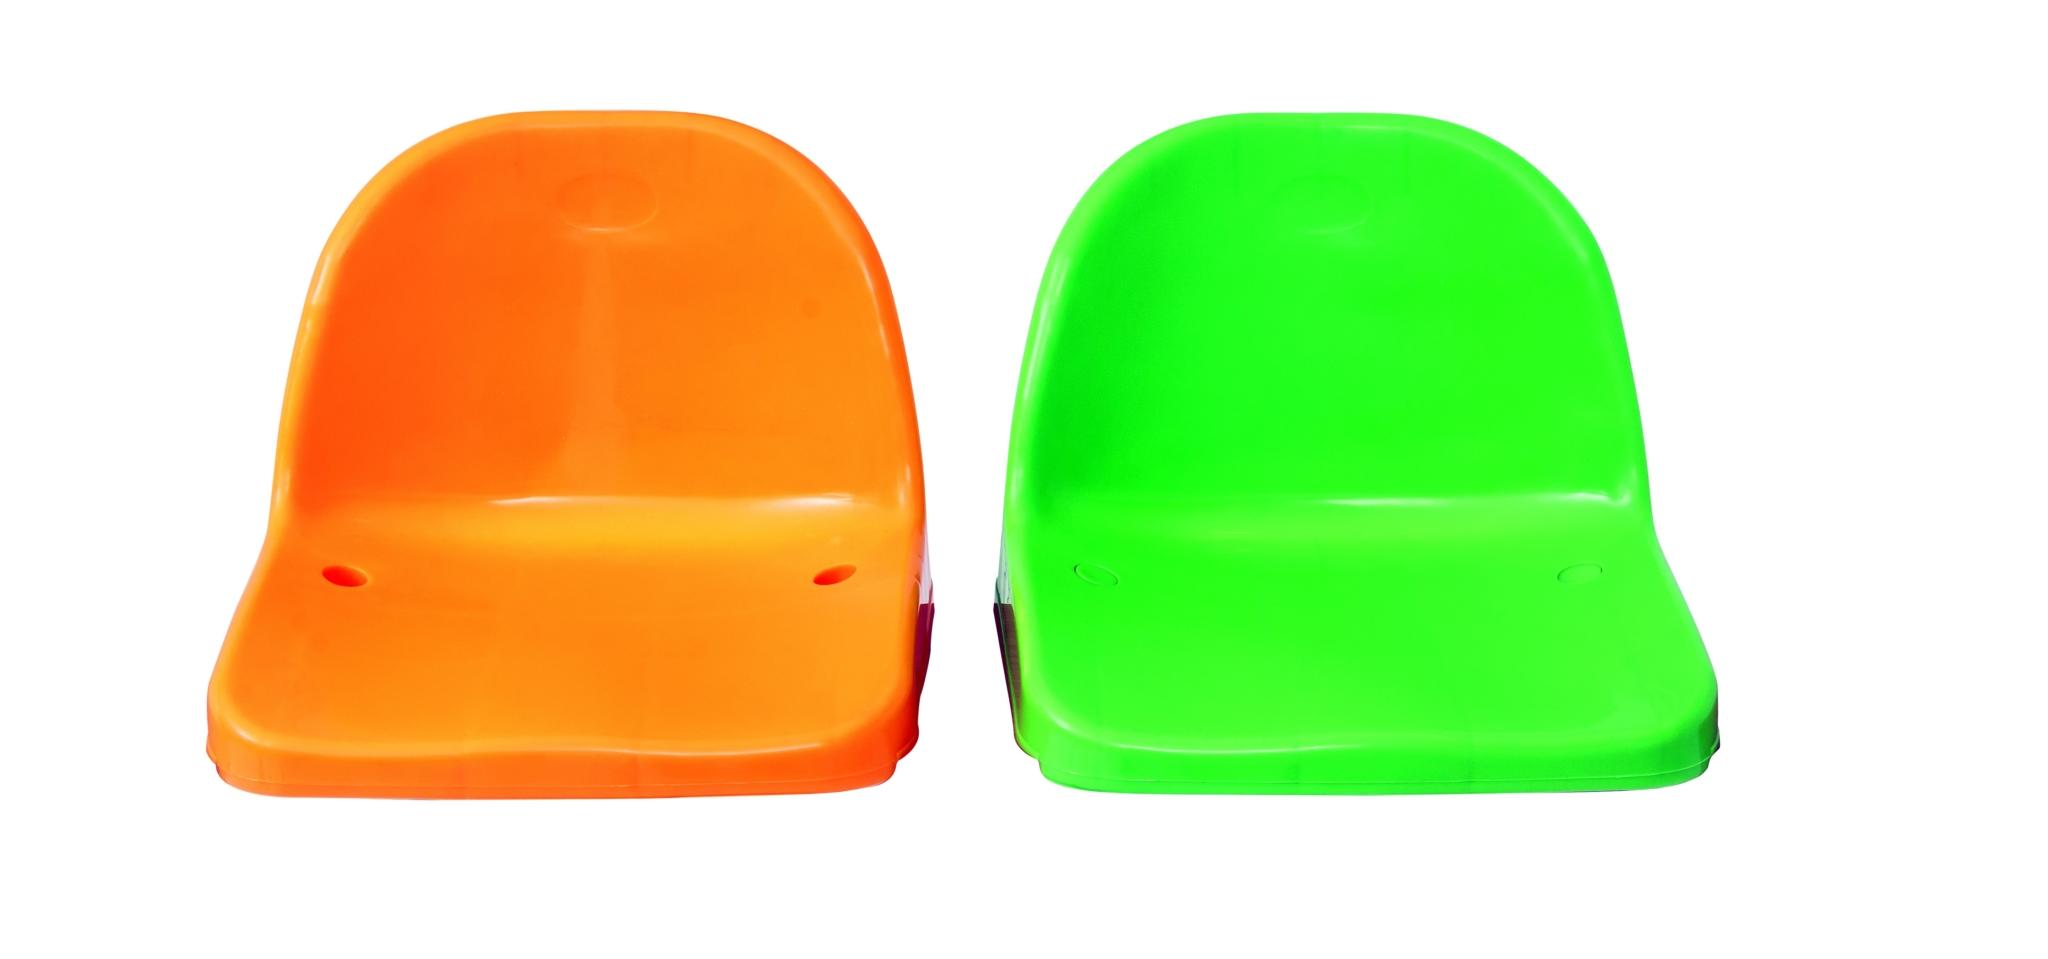 beta_backrest_monoblock_copolymer_pp_stadium_chair_seatorium_19